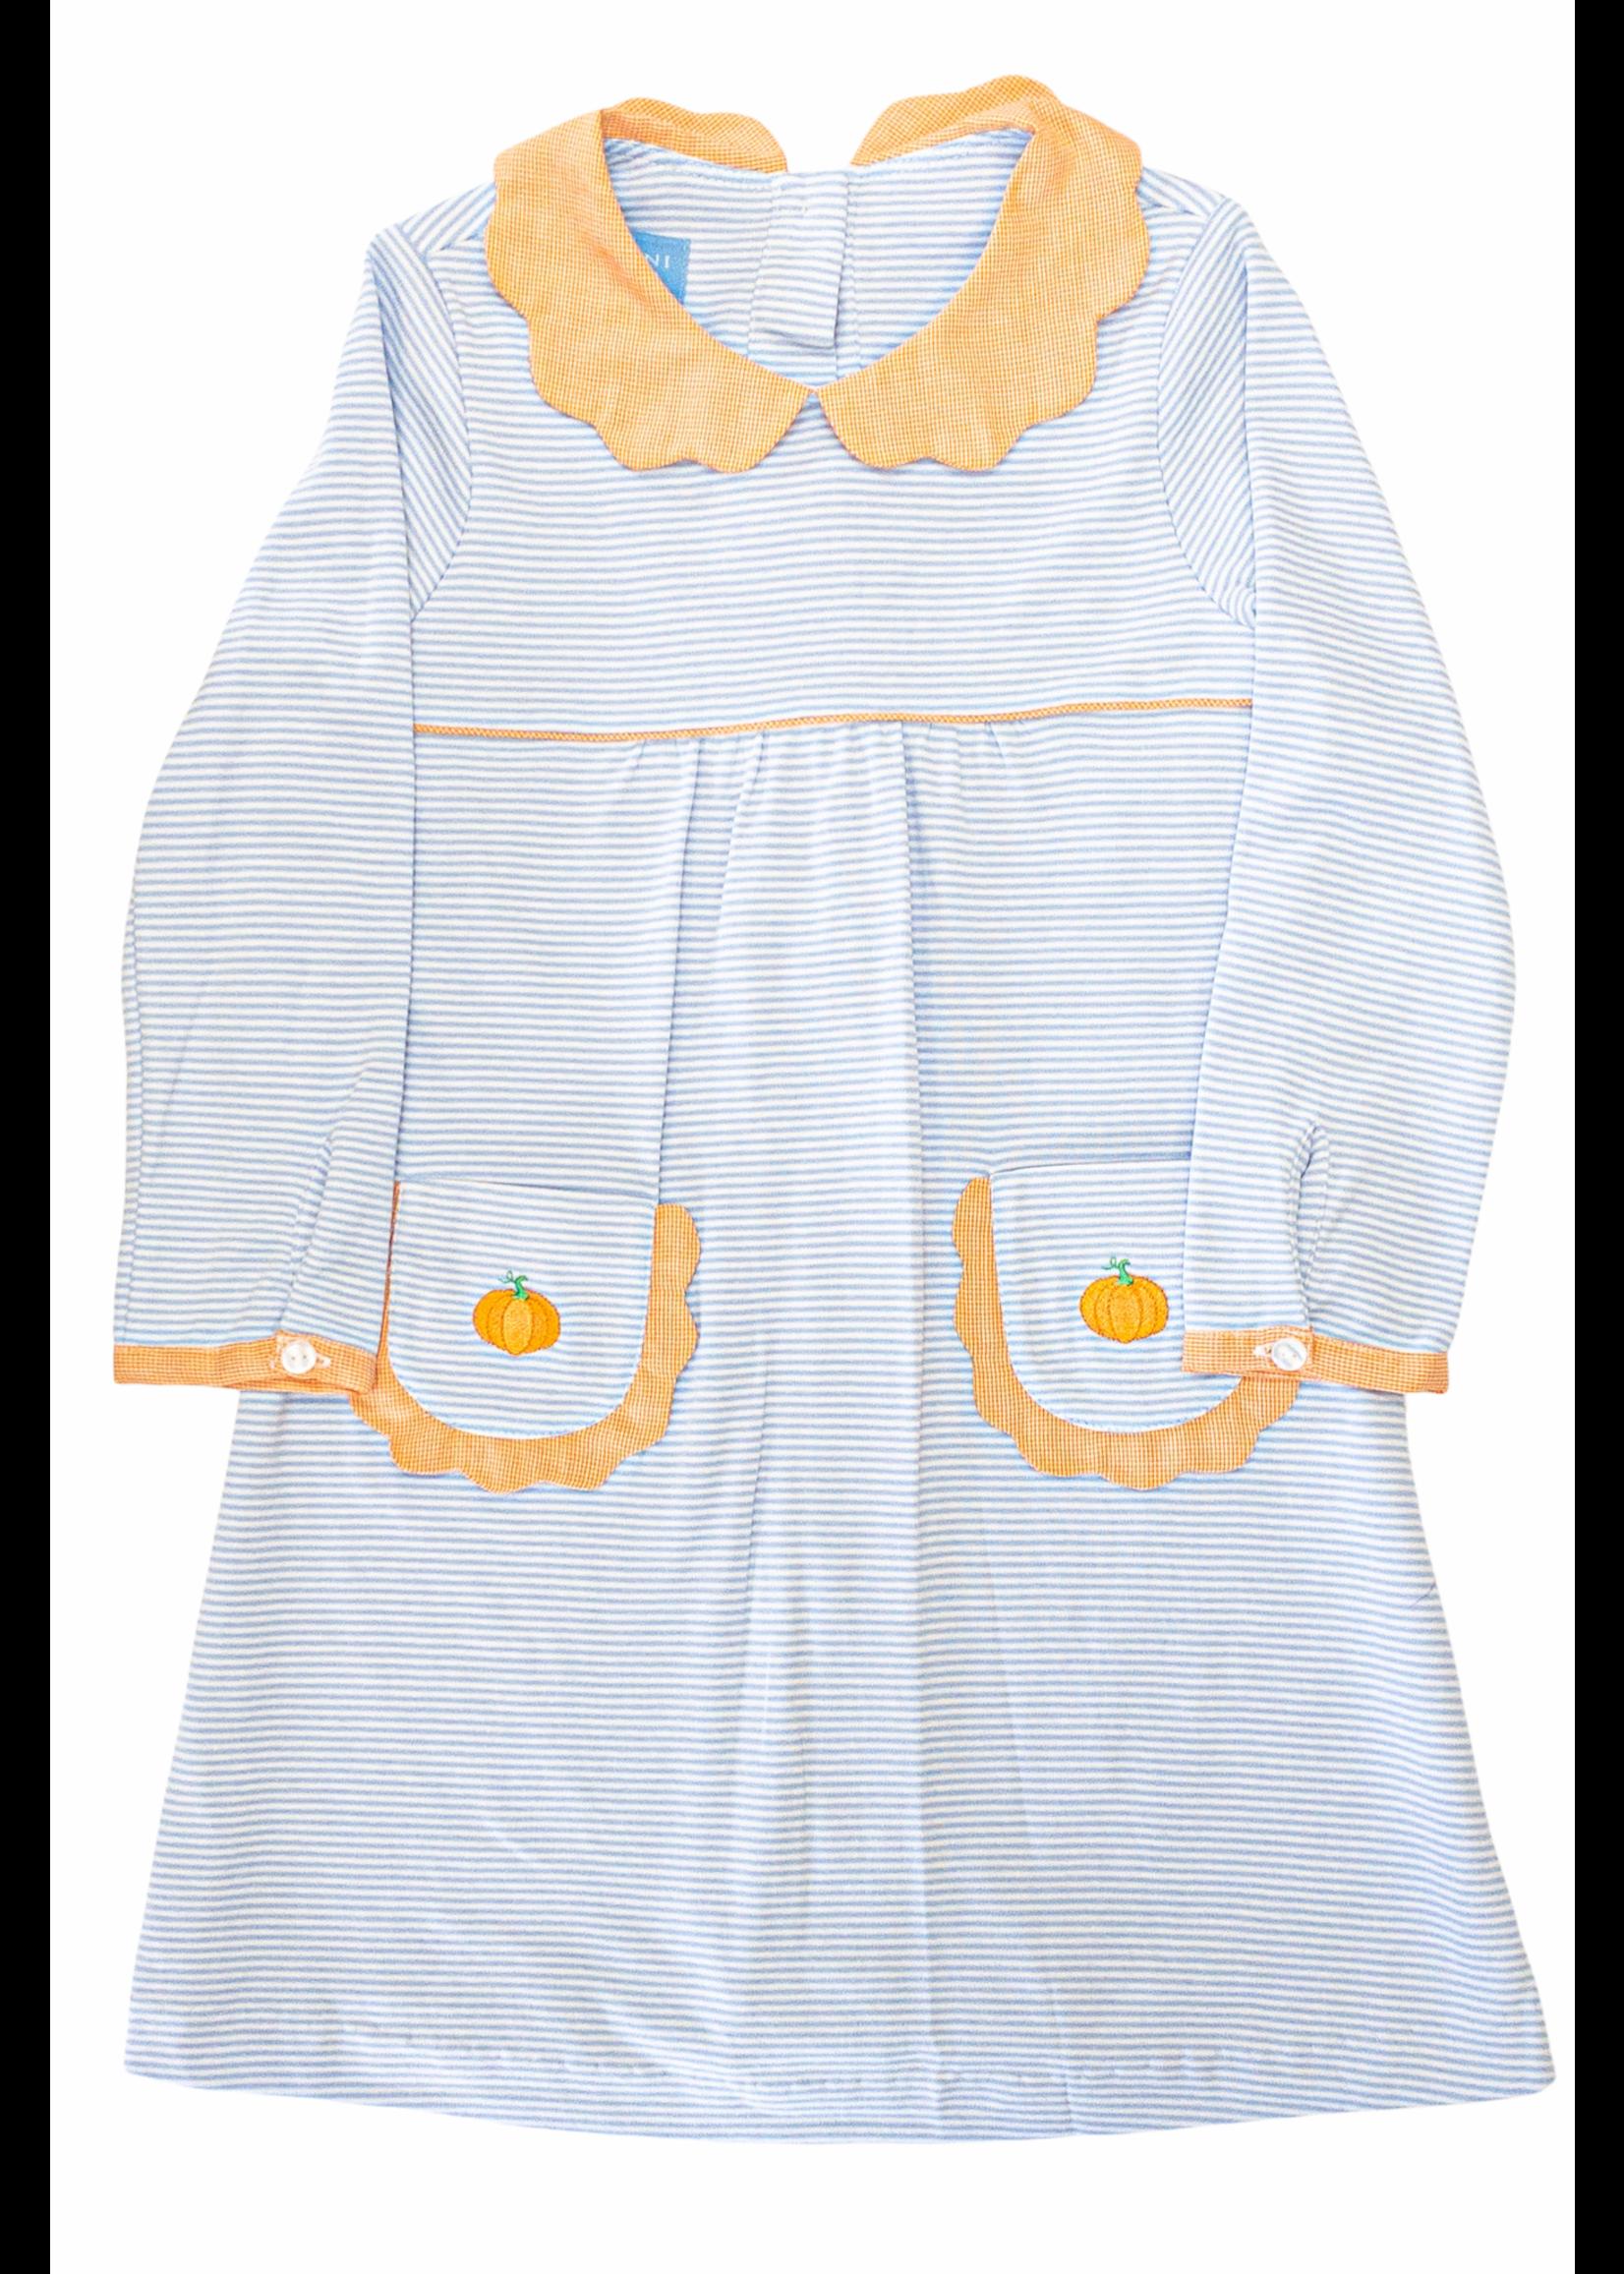 Anavini Pumpkin Periwinkle Blue Stripe Knit Scallop Dress